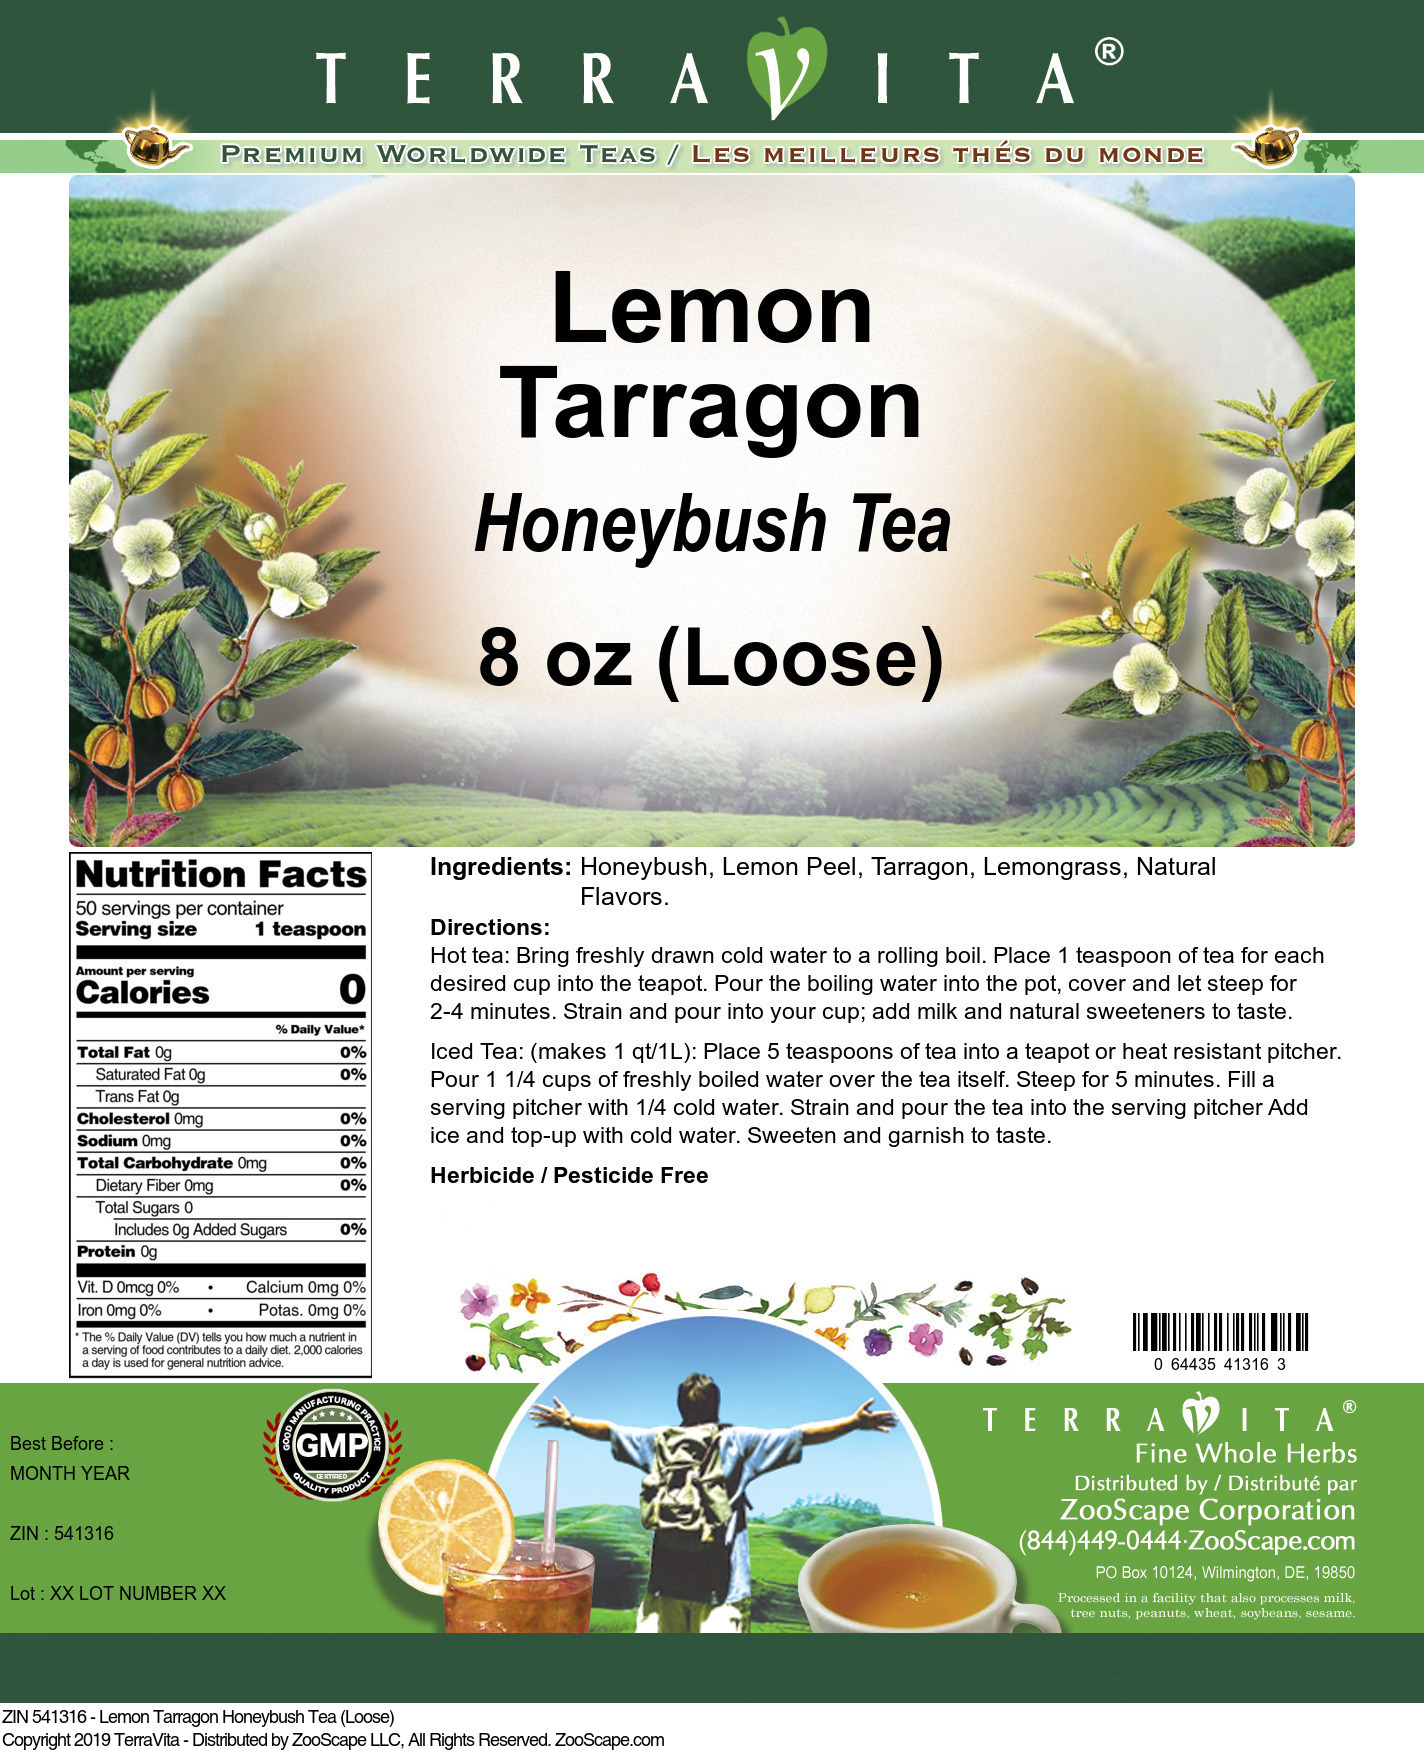 Lemon Tarragon Honeybush Tea (Loose)